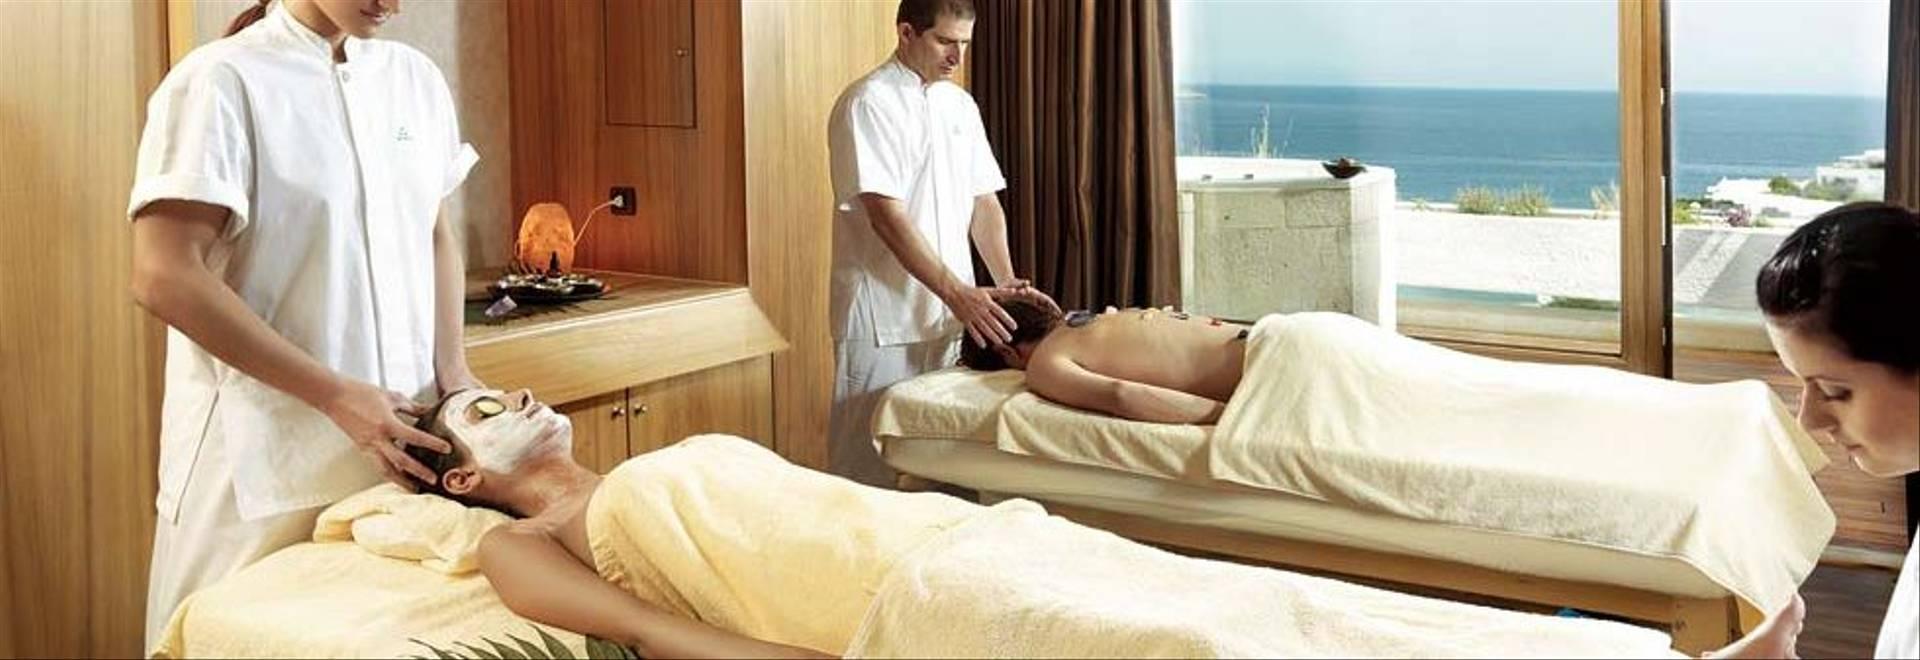 Porto-Elounda_couples-treatment.jpg